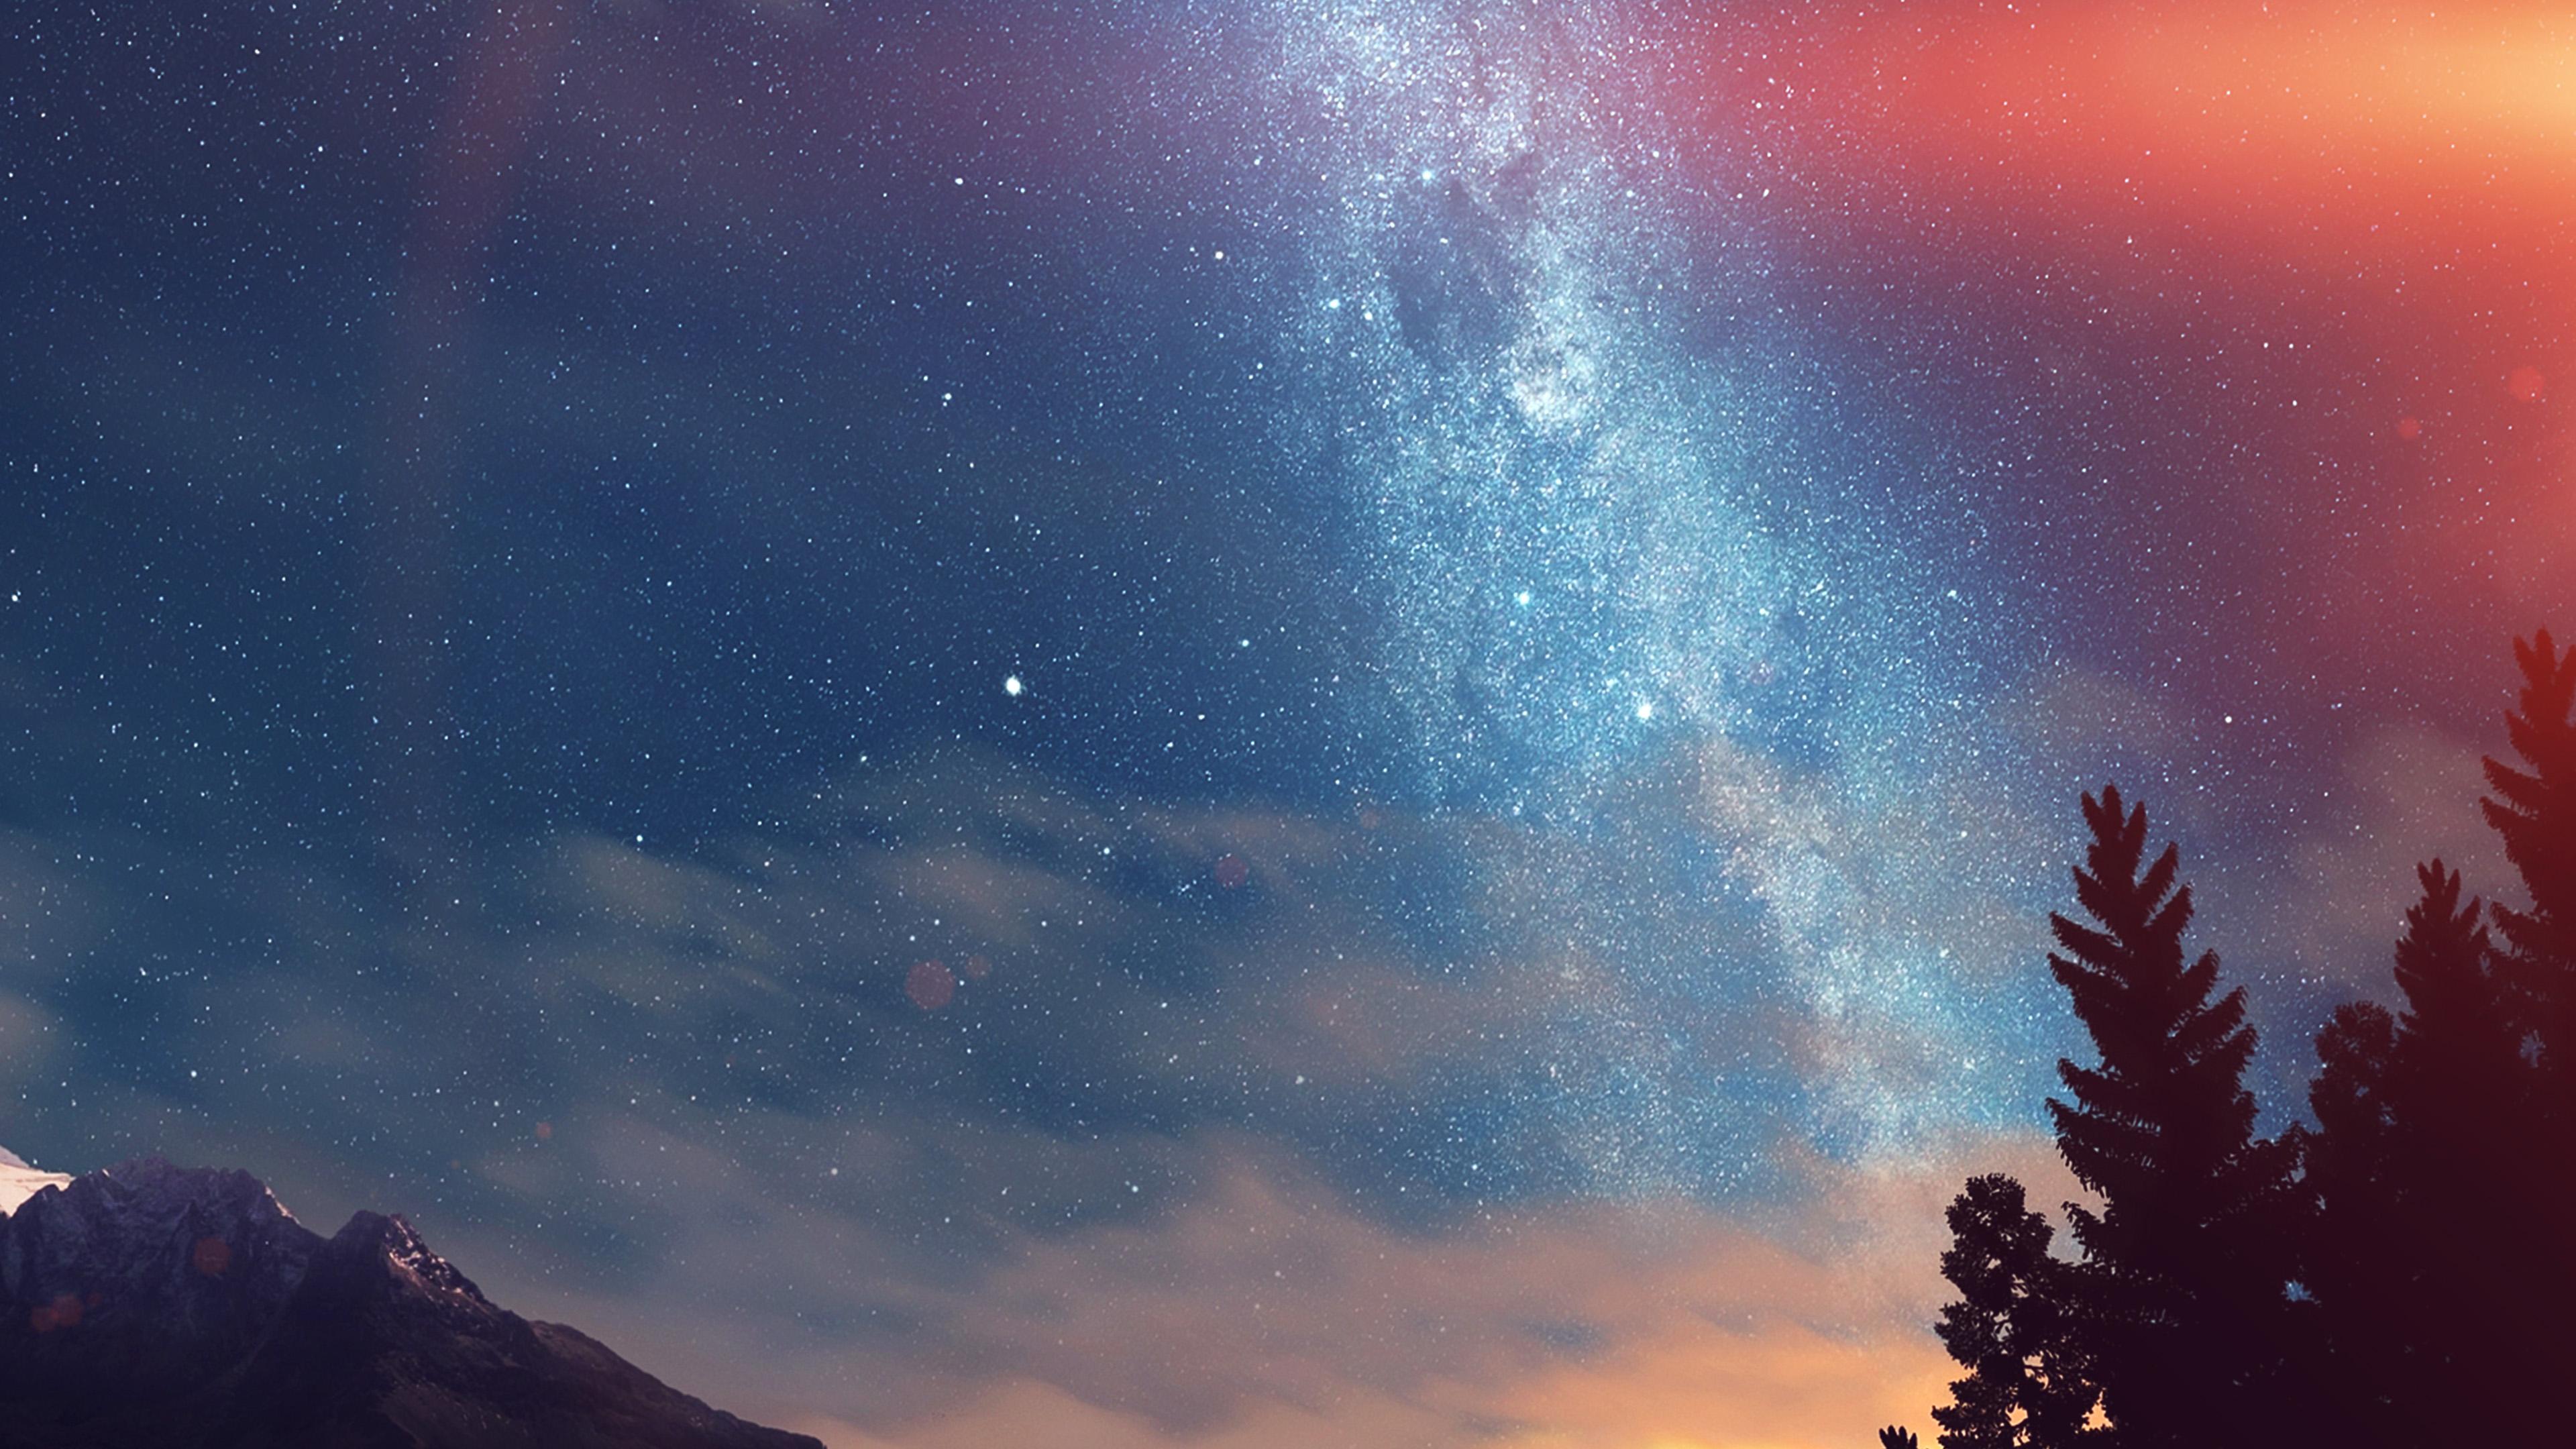 nd08-wonderful-tonight-space-star-sunset-mountain-flare-wallpaper